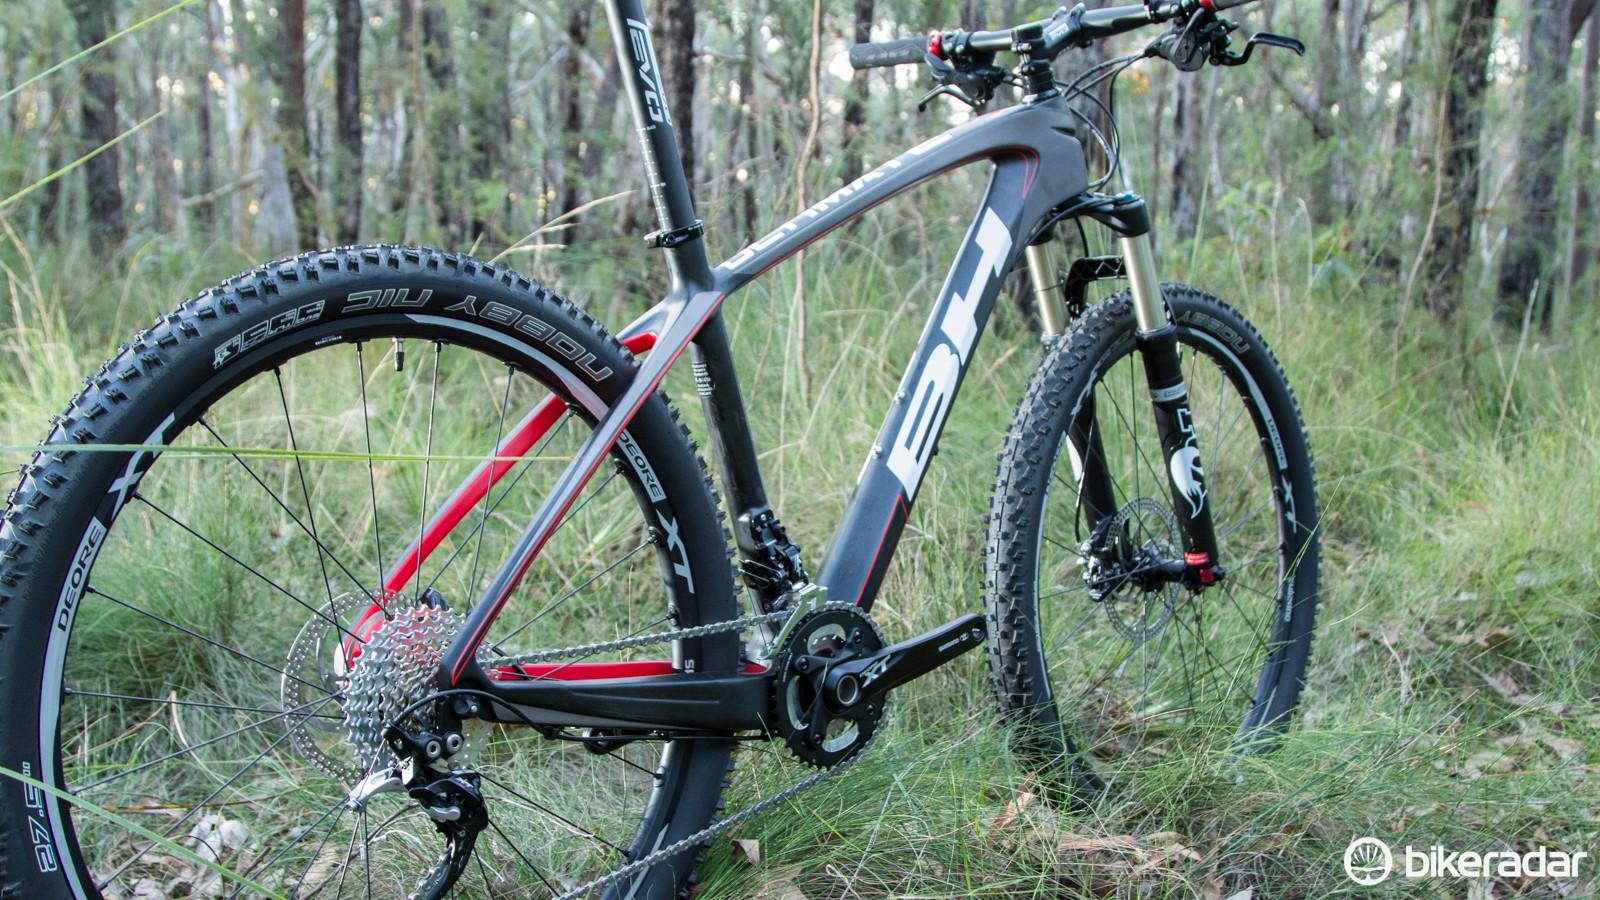 5b7509cda Bh Ultimate Rc 27 5 Xt Bikeradar. Ultimate Evo 9 Bh Bikes